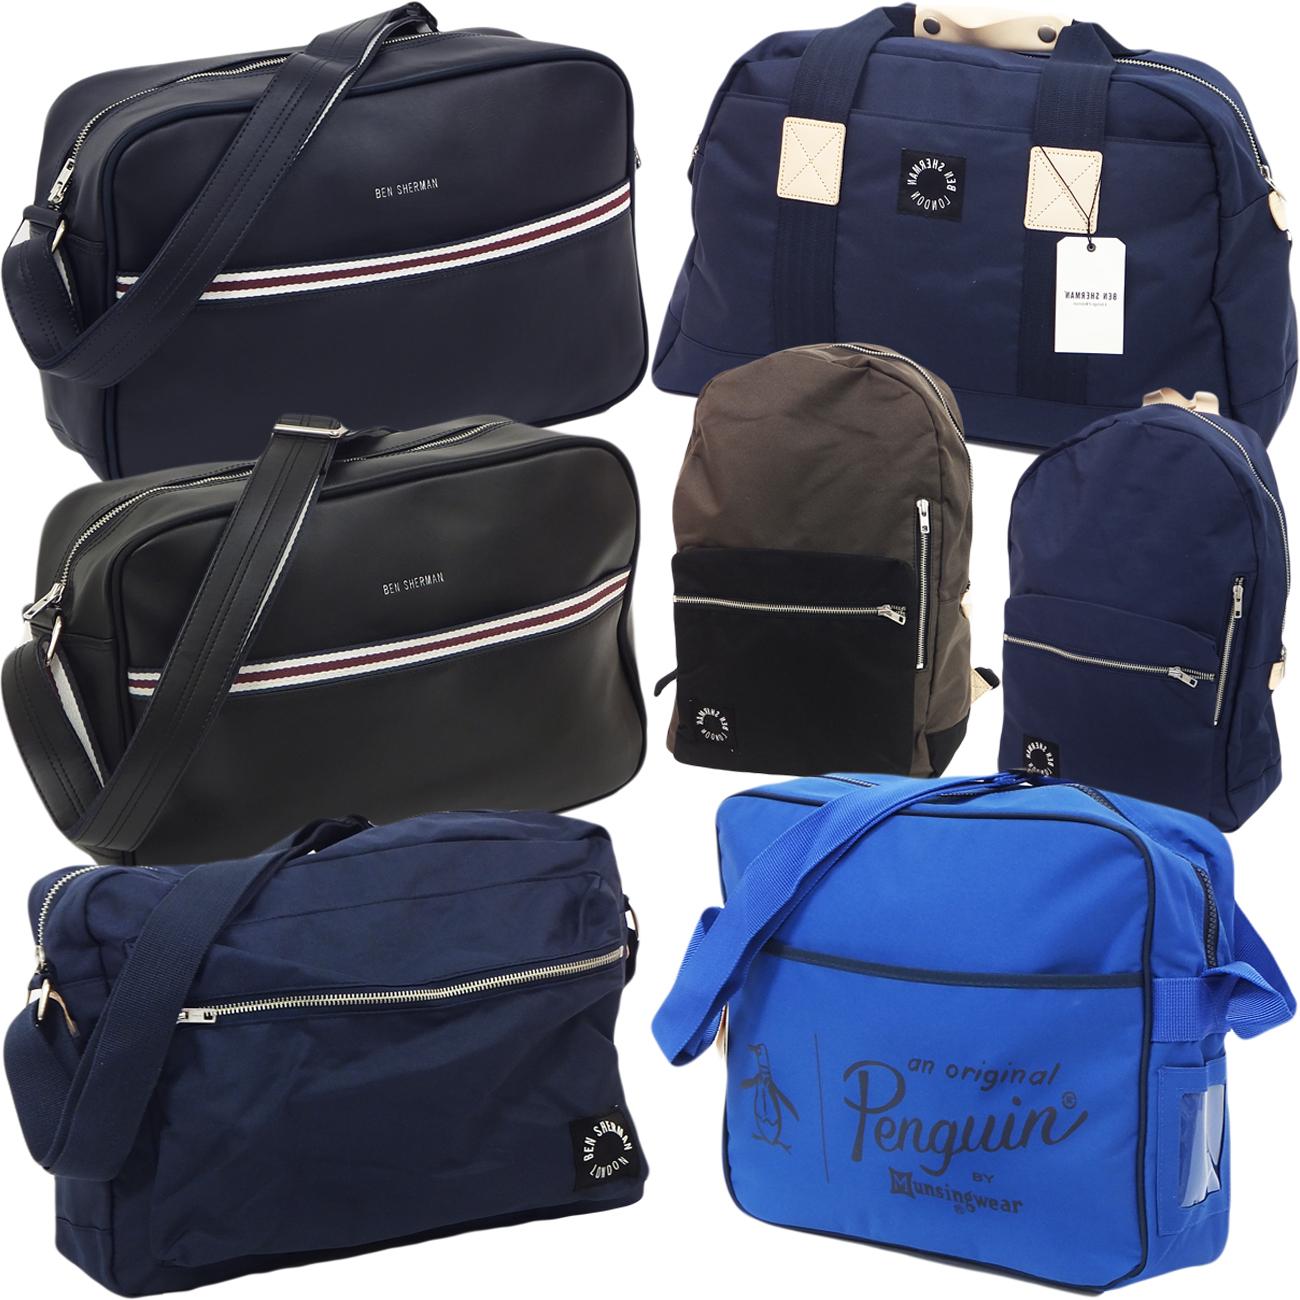 Gym Bag For Work: Mens Bags School Record Bag / Work Gym Holdall Messenger